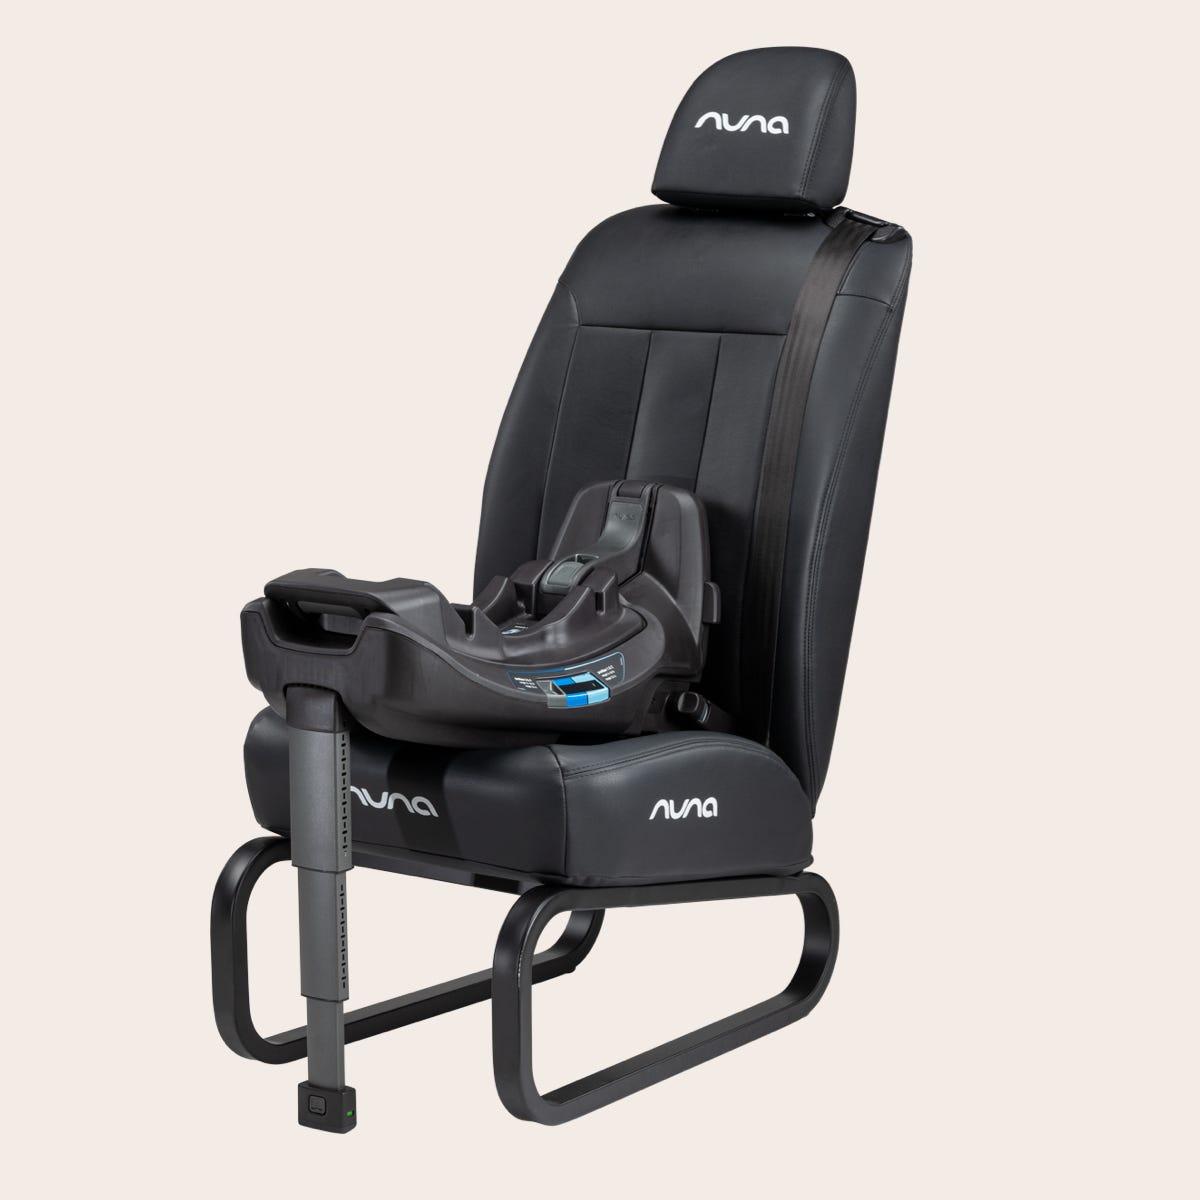 Nuna RELX™ base on chair